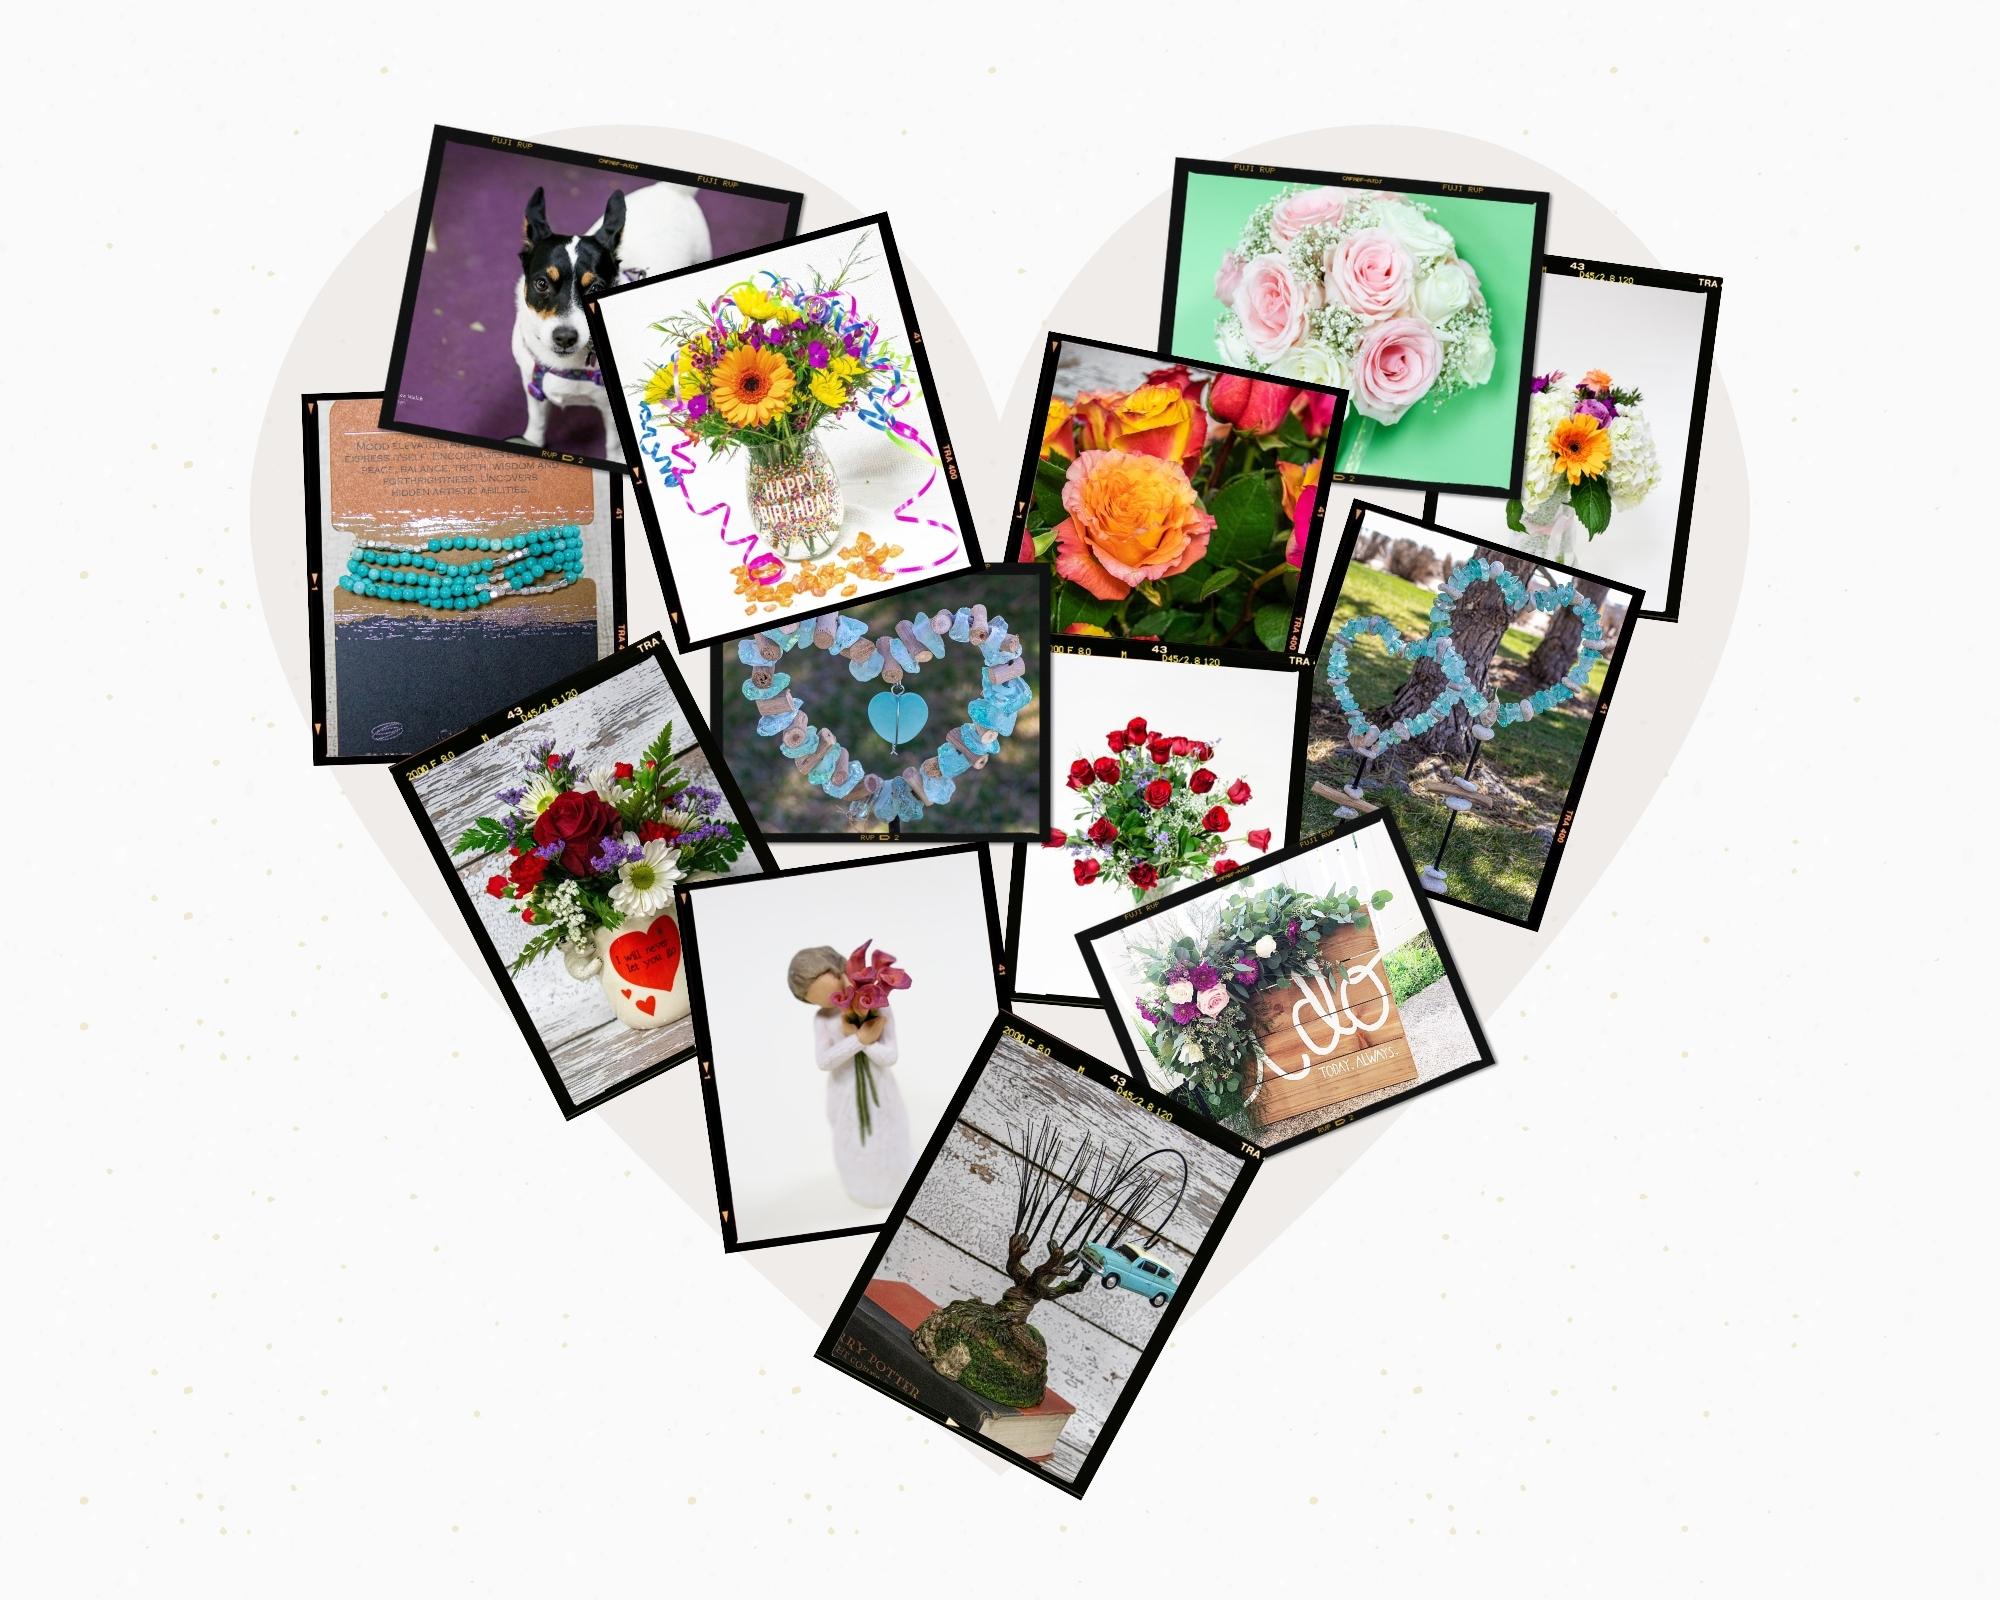 cream-polaroid-heart-shaped-photo-collage.jpg